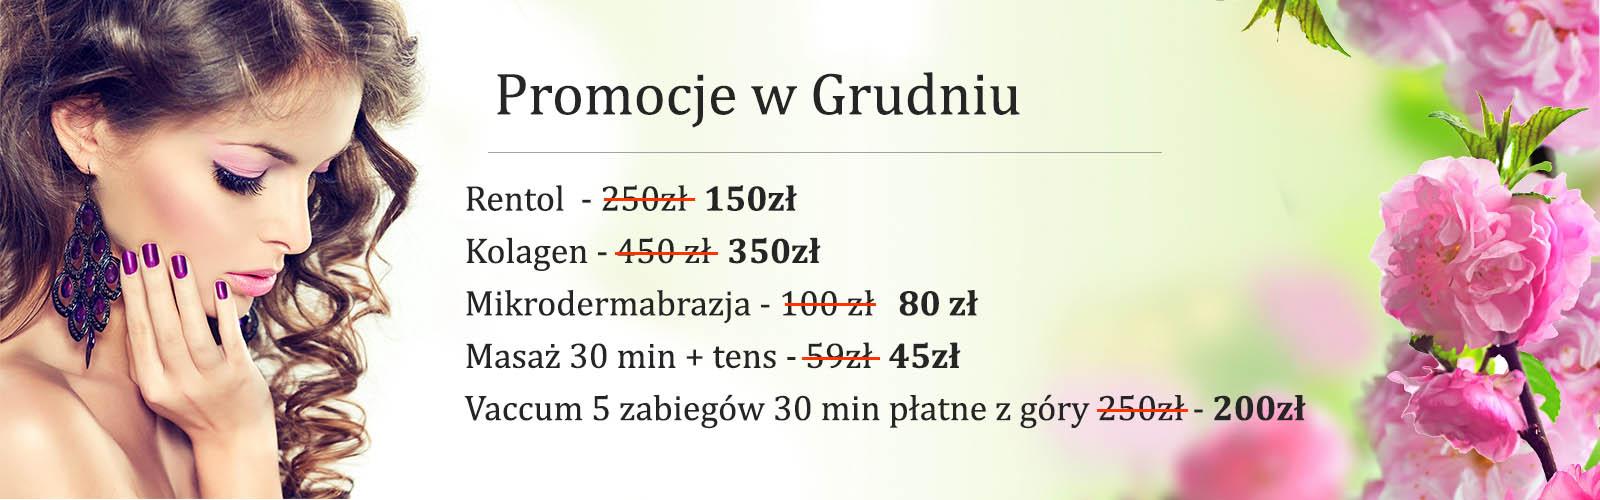 promka-grudzien-2018